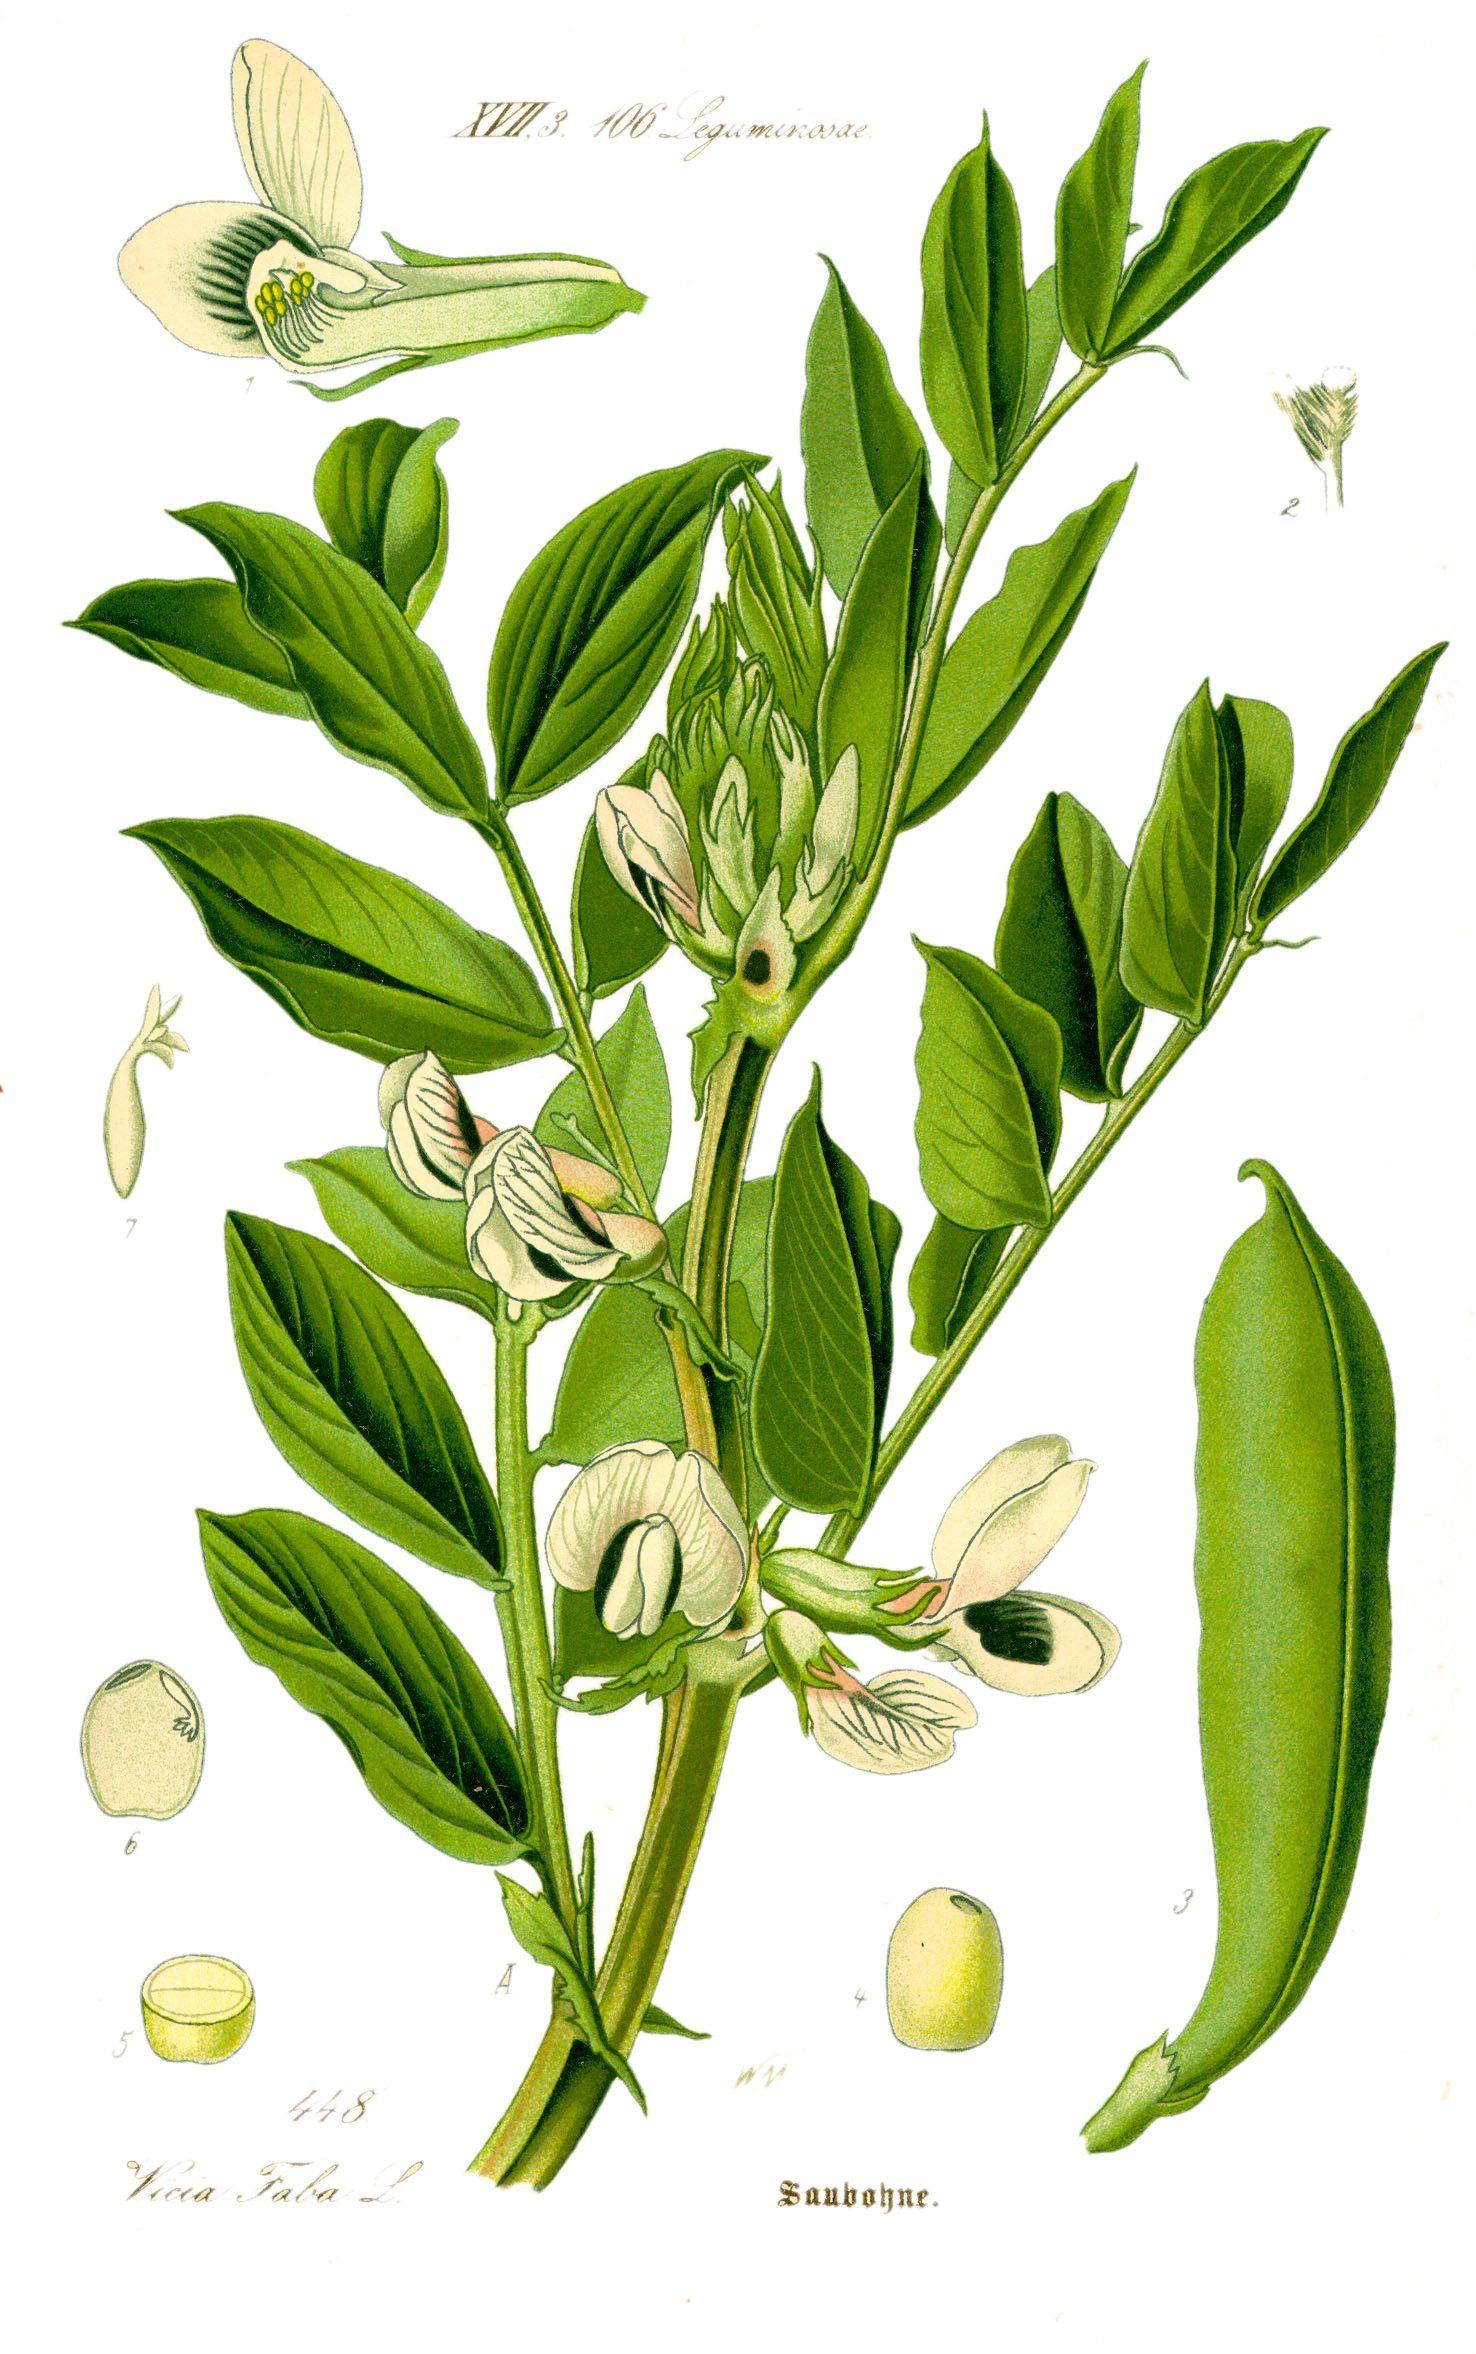 Broad Bean Botanical Print Botanica Ilustraciones 400 x 300